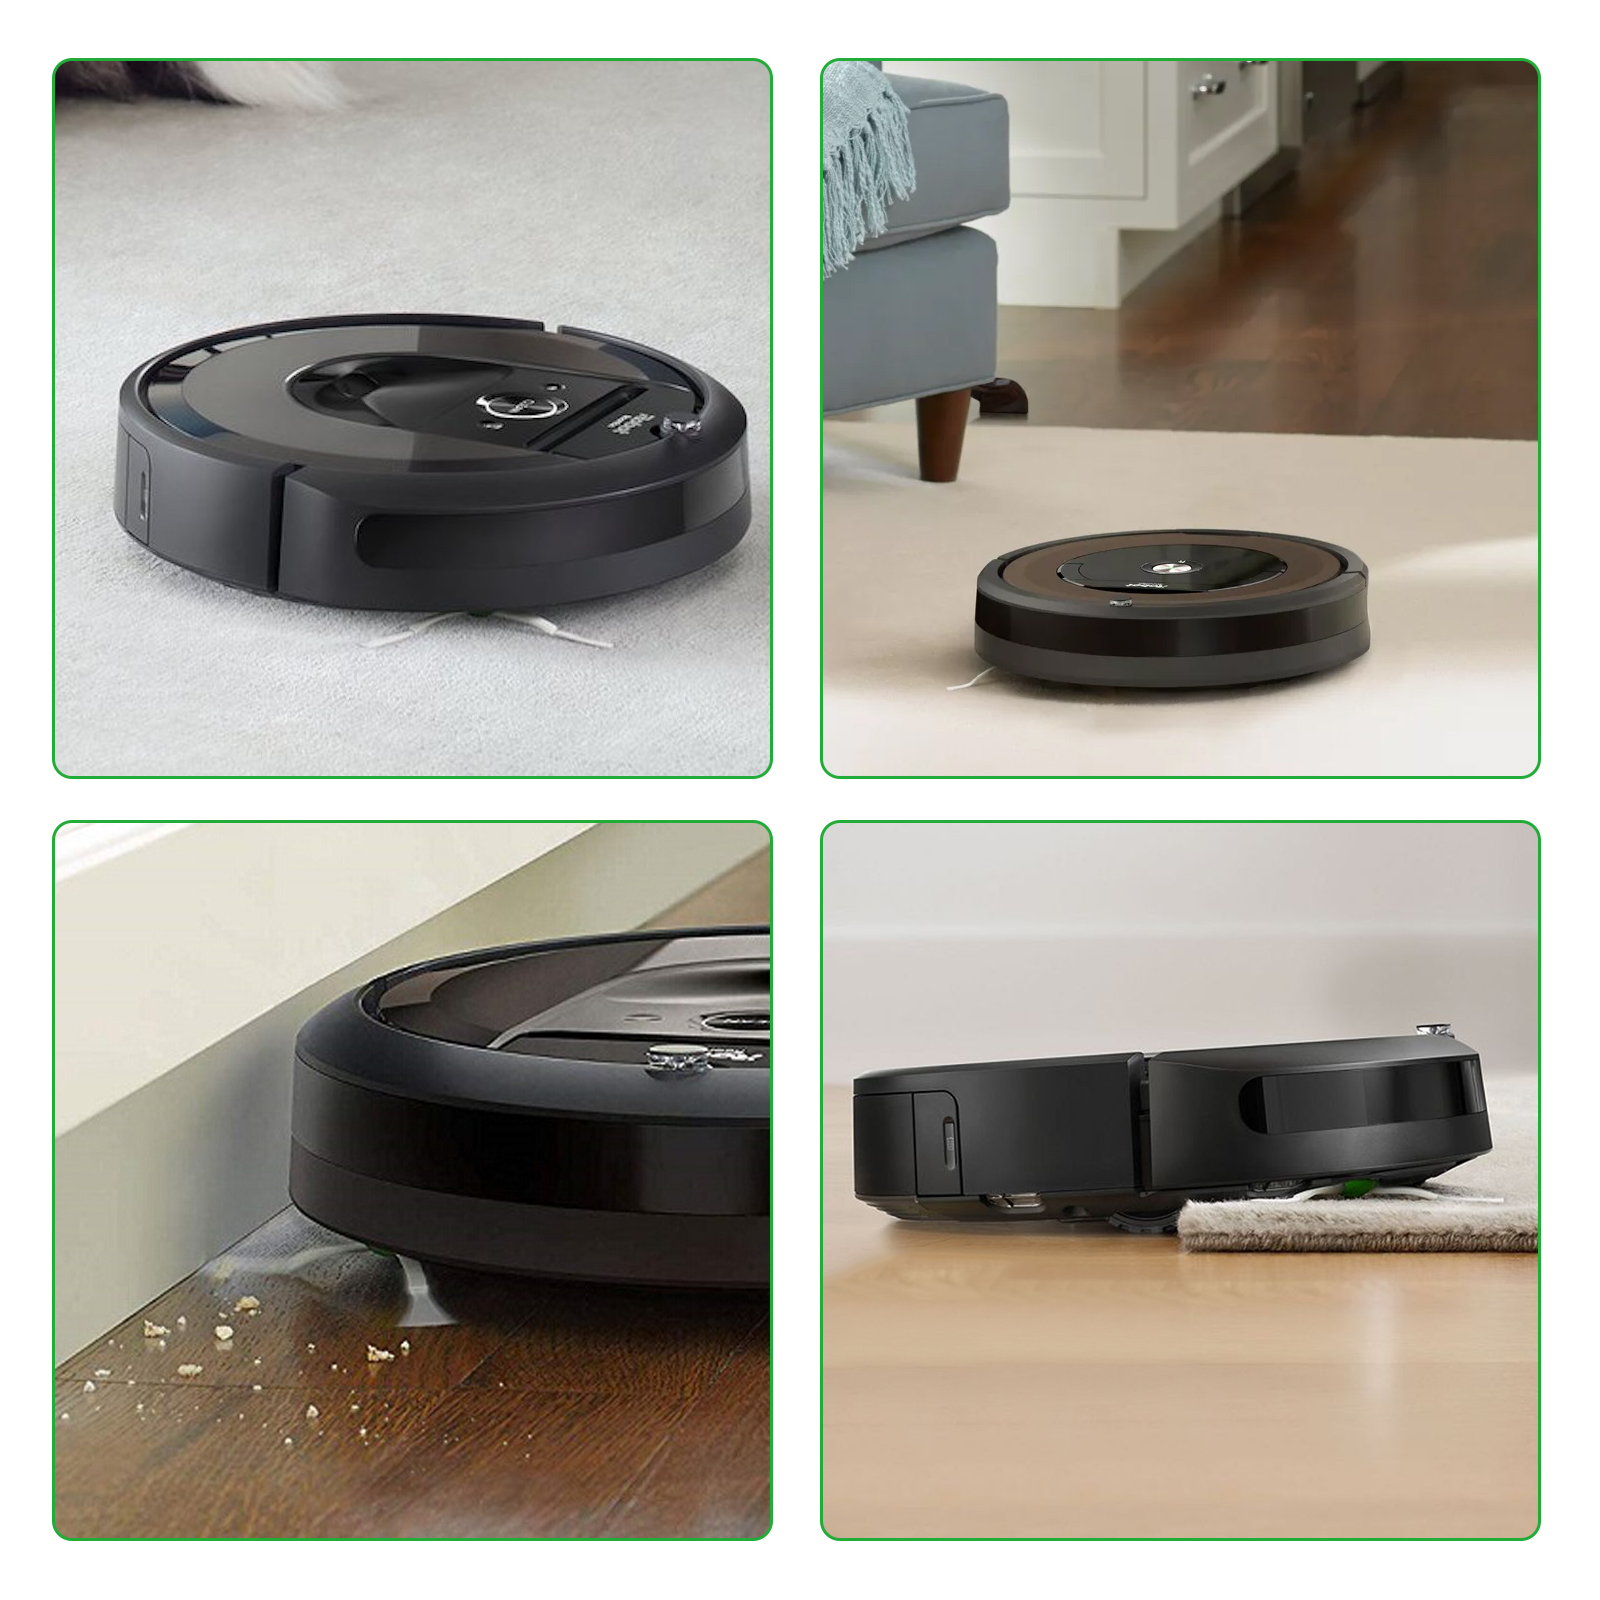 Robotics LOVECO 2 Set Replacement Rubber Brush Compatible for iRobot Roomba E Series E5 E6 i Series i7 i7 i7 Plus i3 i3